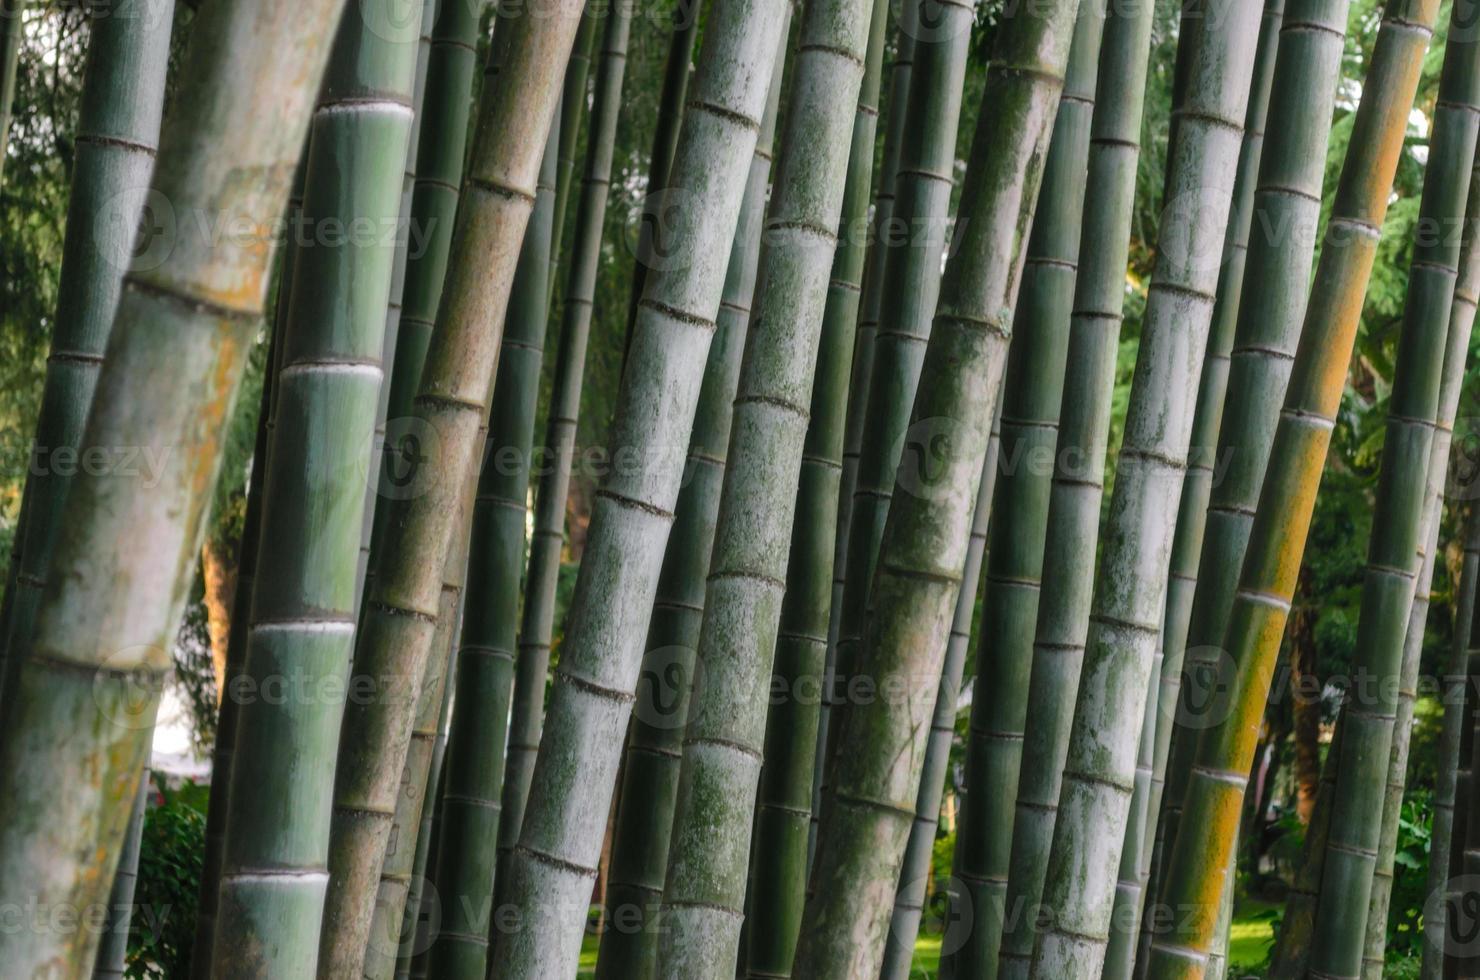 close-up van bamboe schors foto